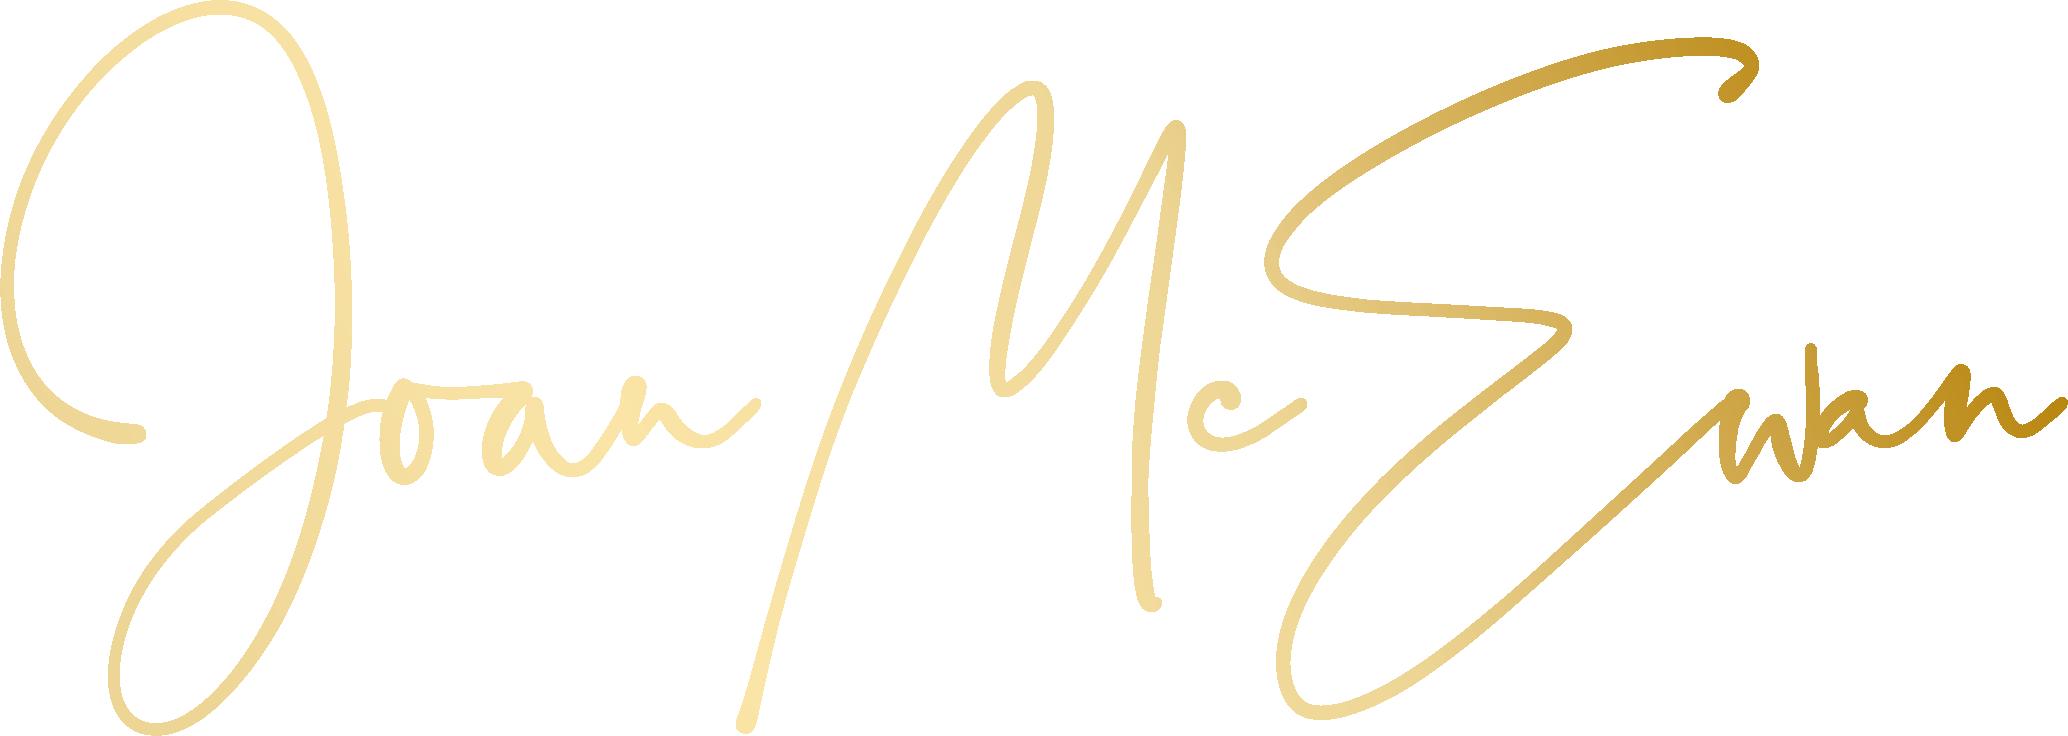 Joan McEwan logo_Gradient Gold